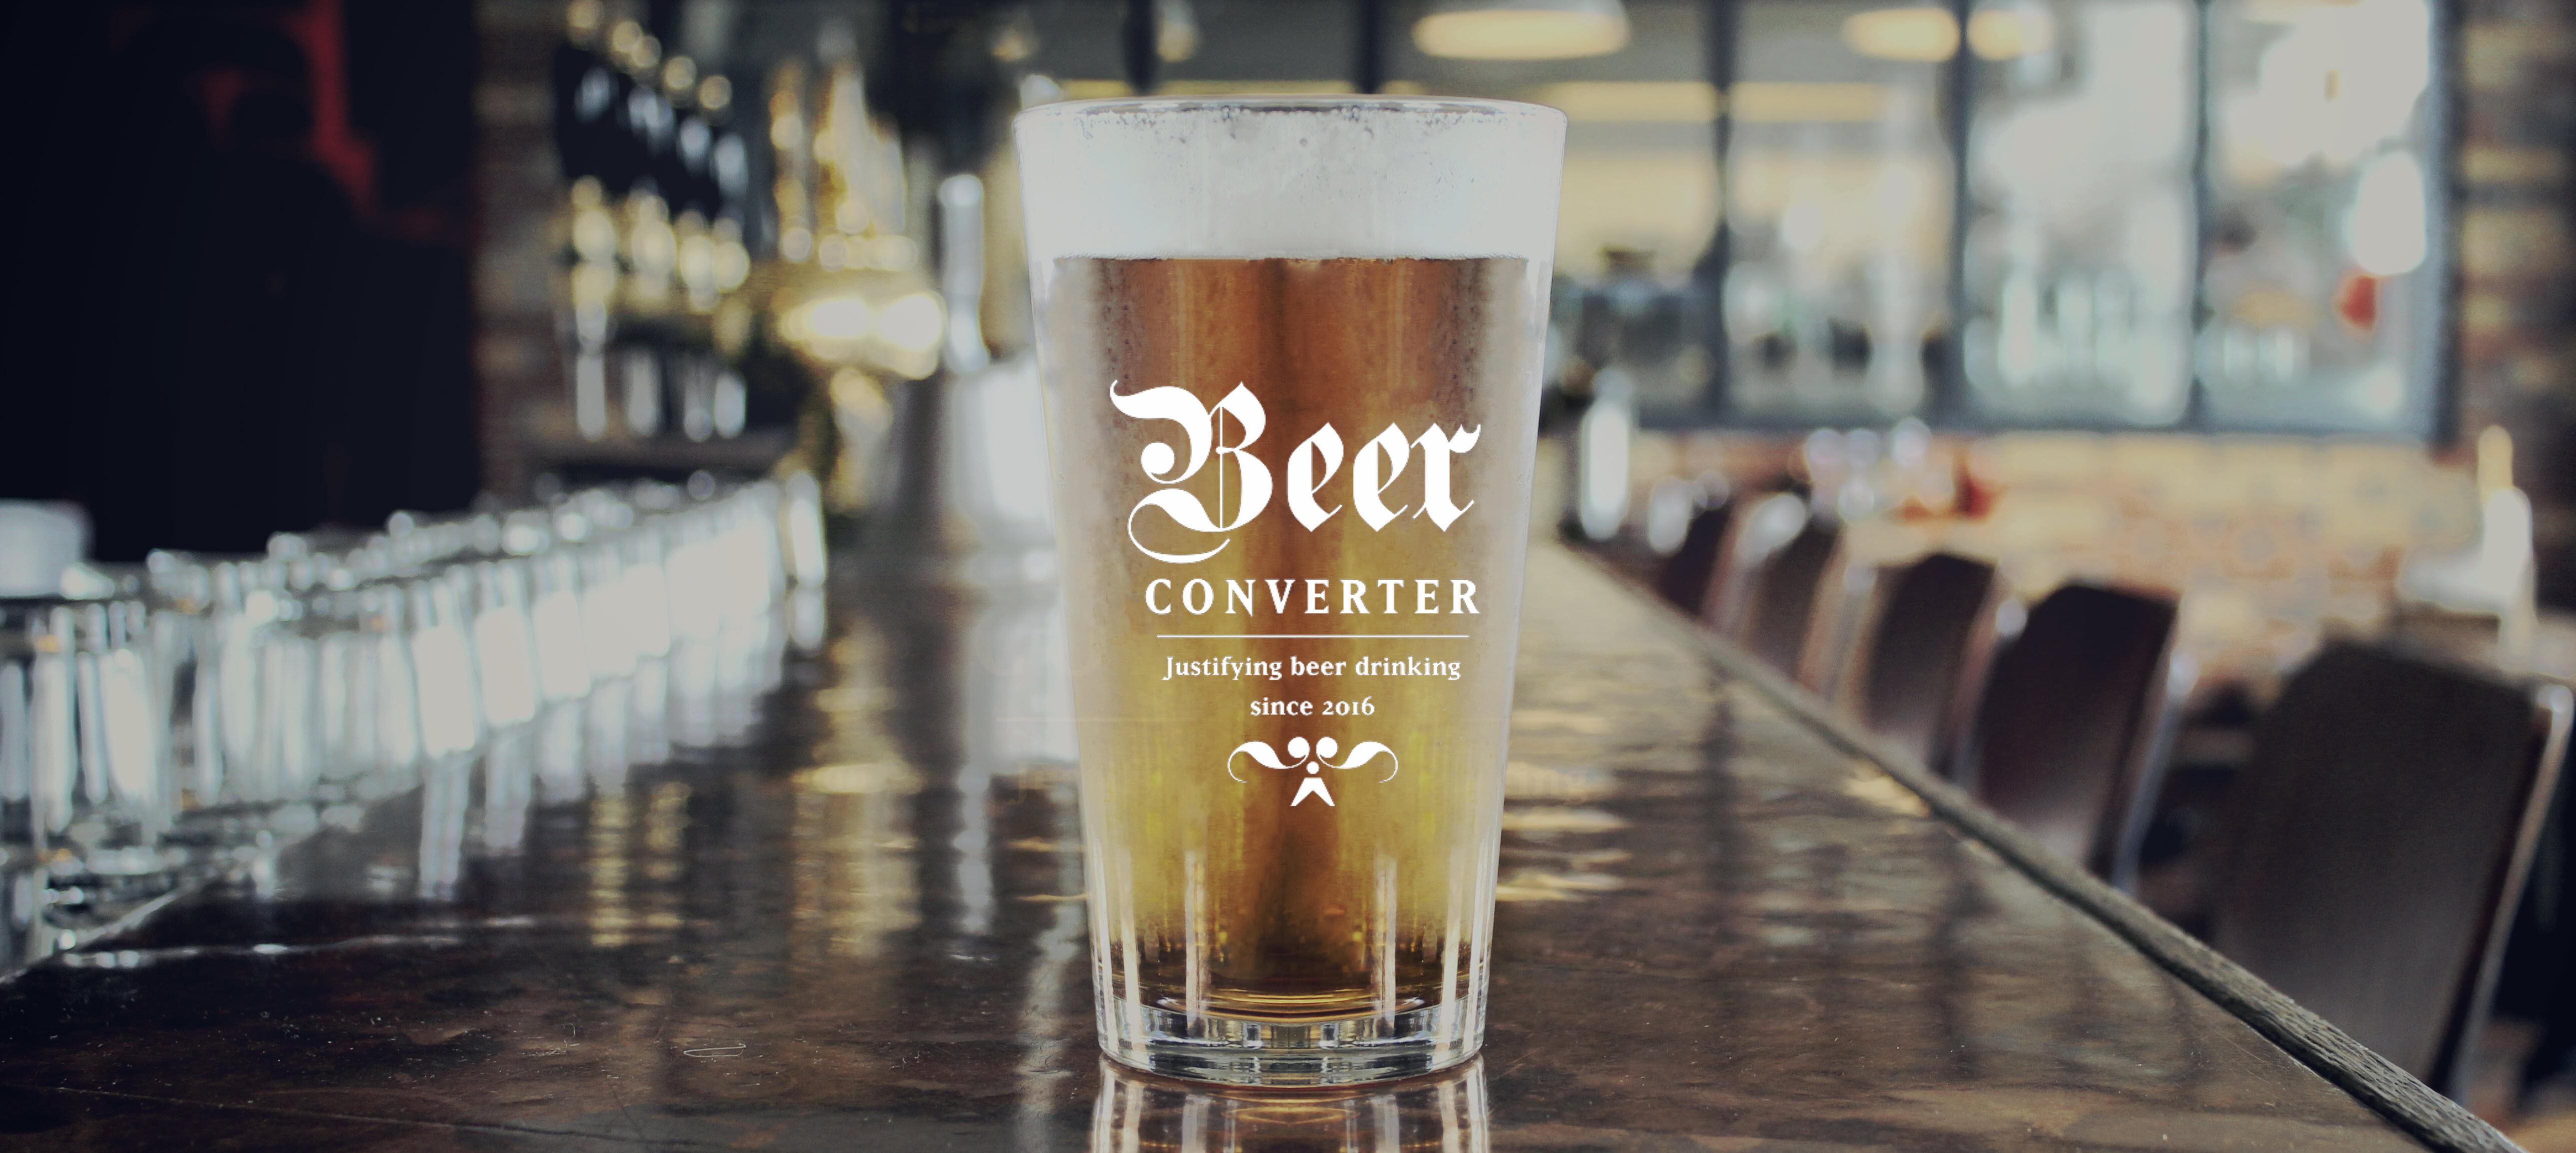 Beer_converter_forsíða